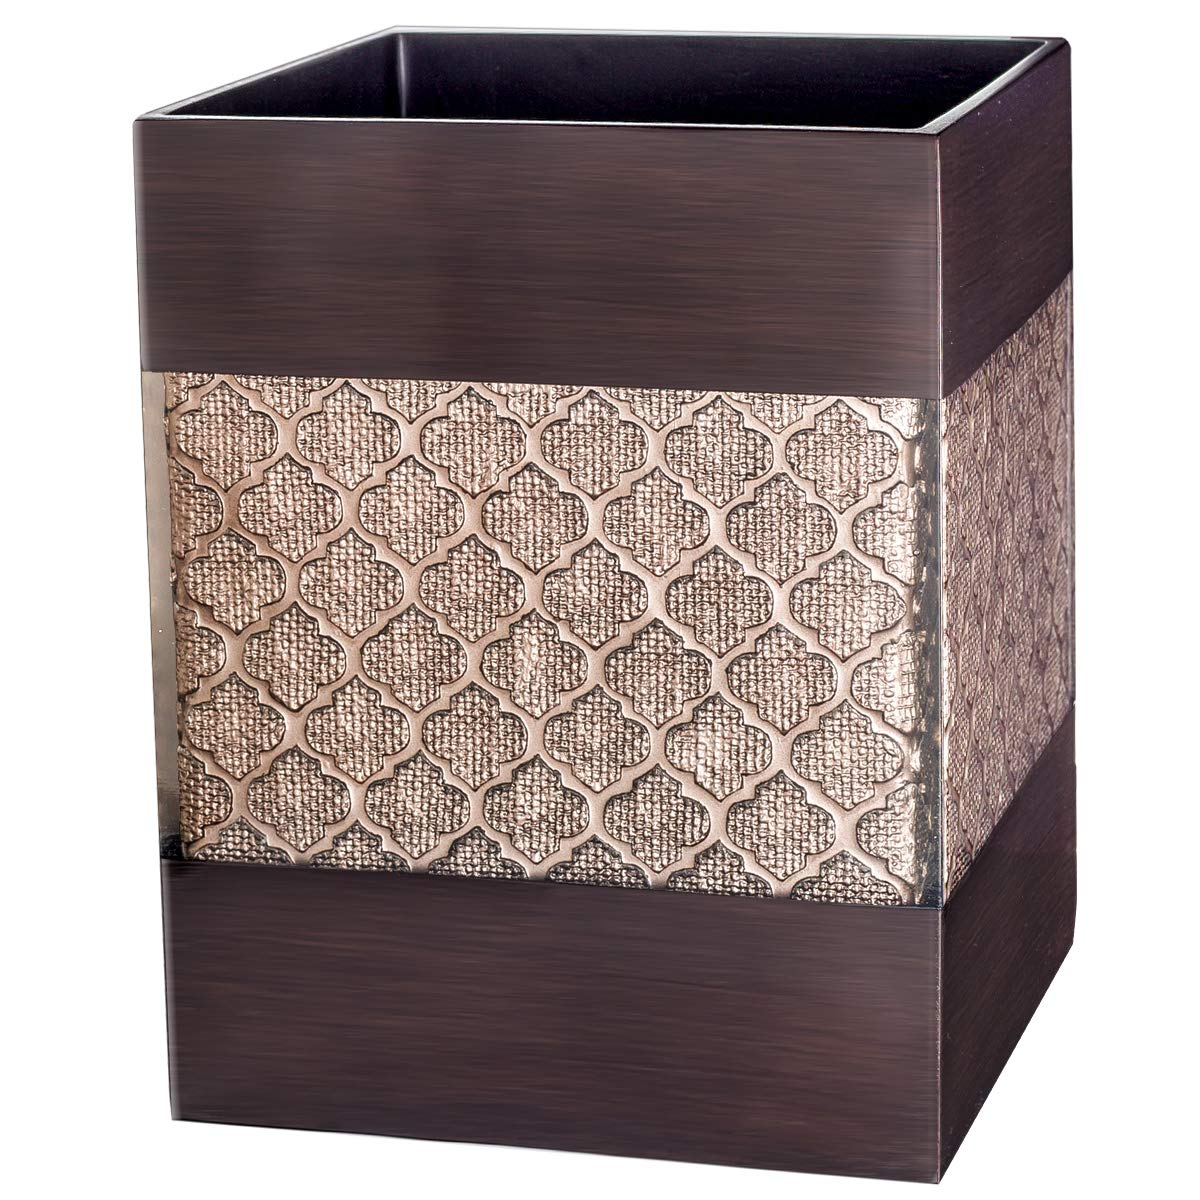 Creative High order Scents Dahlia Bathroom Trash - 40% OFF Cheap Sale Can Decorative Wastebask